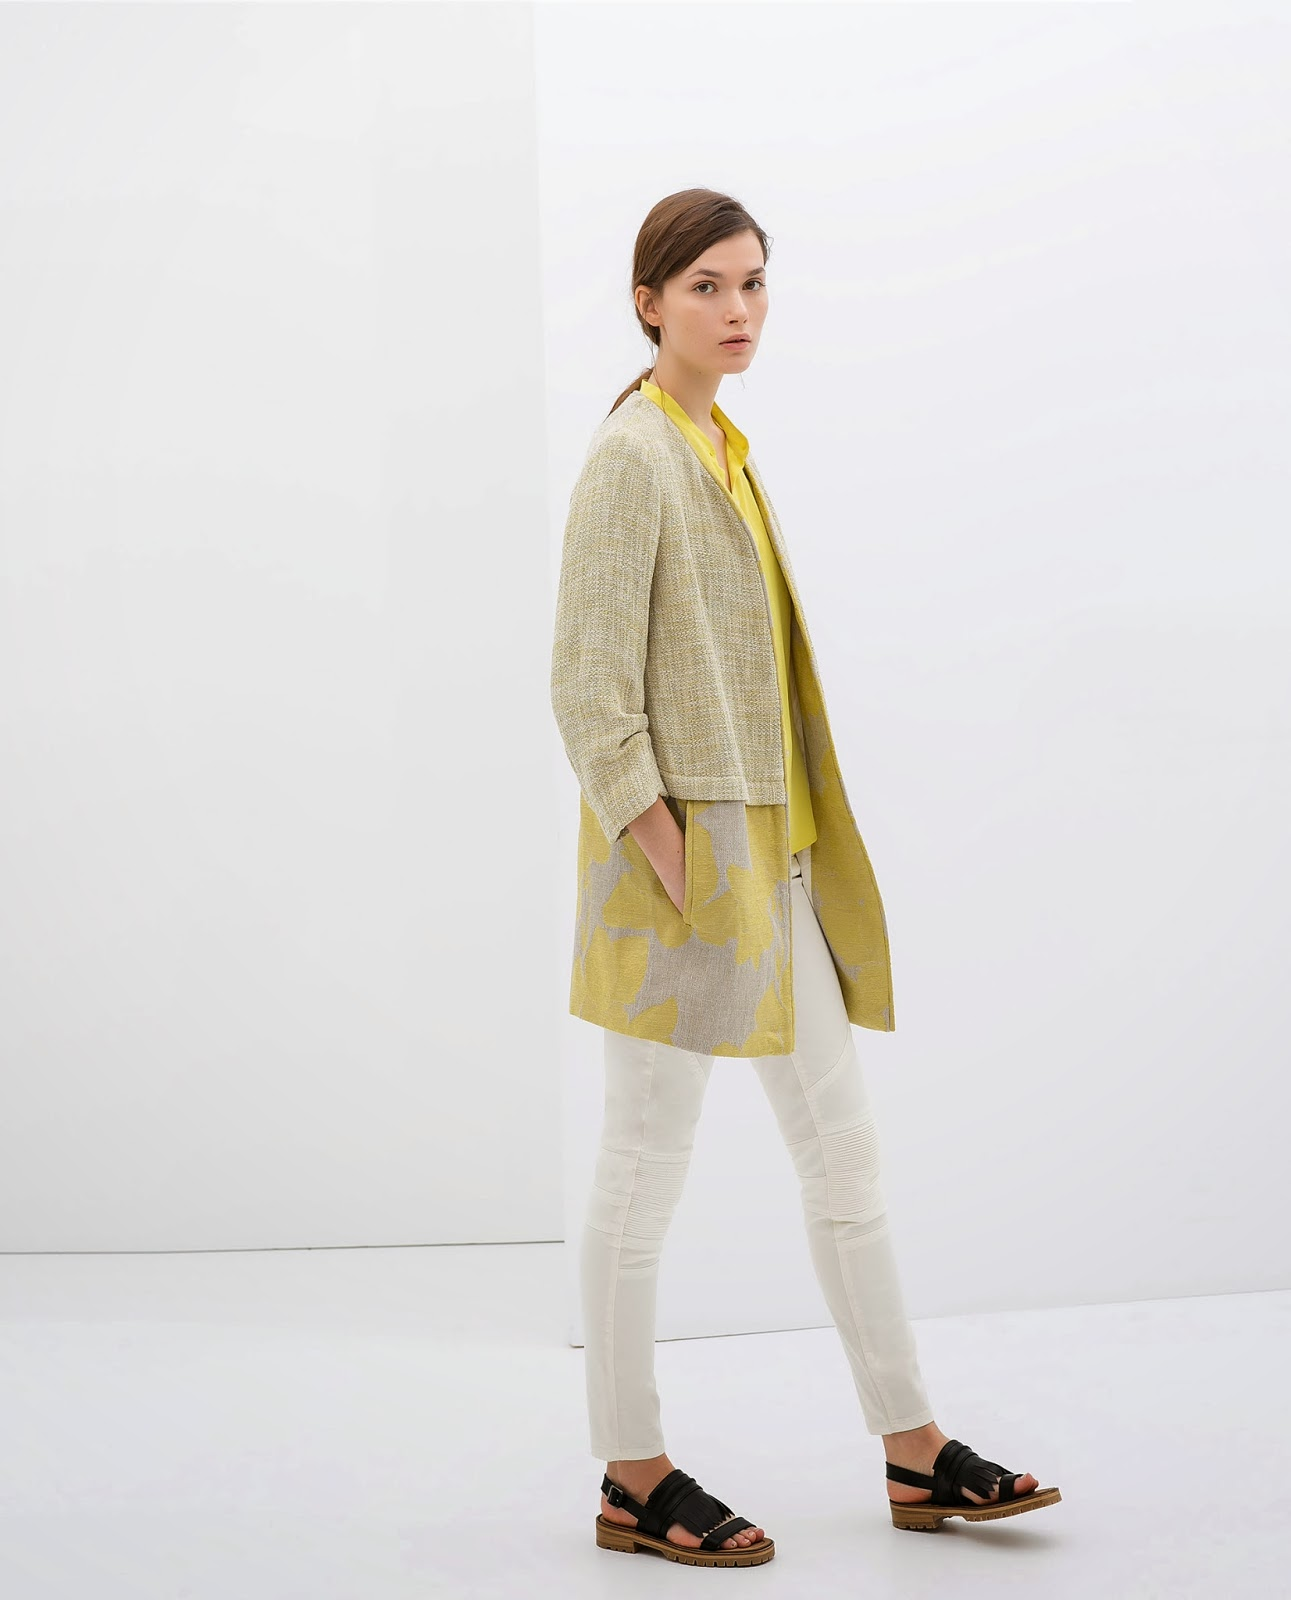 zara patterned coat